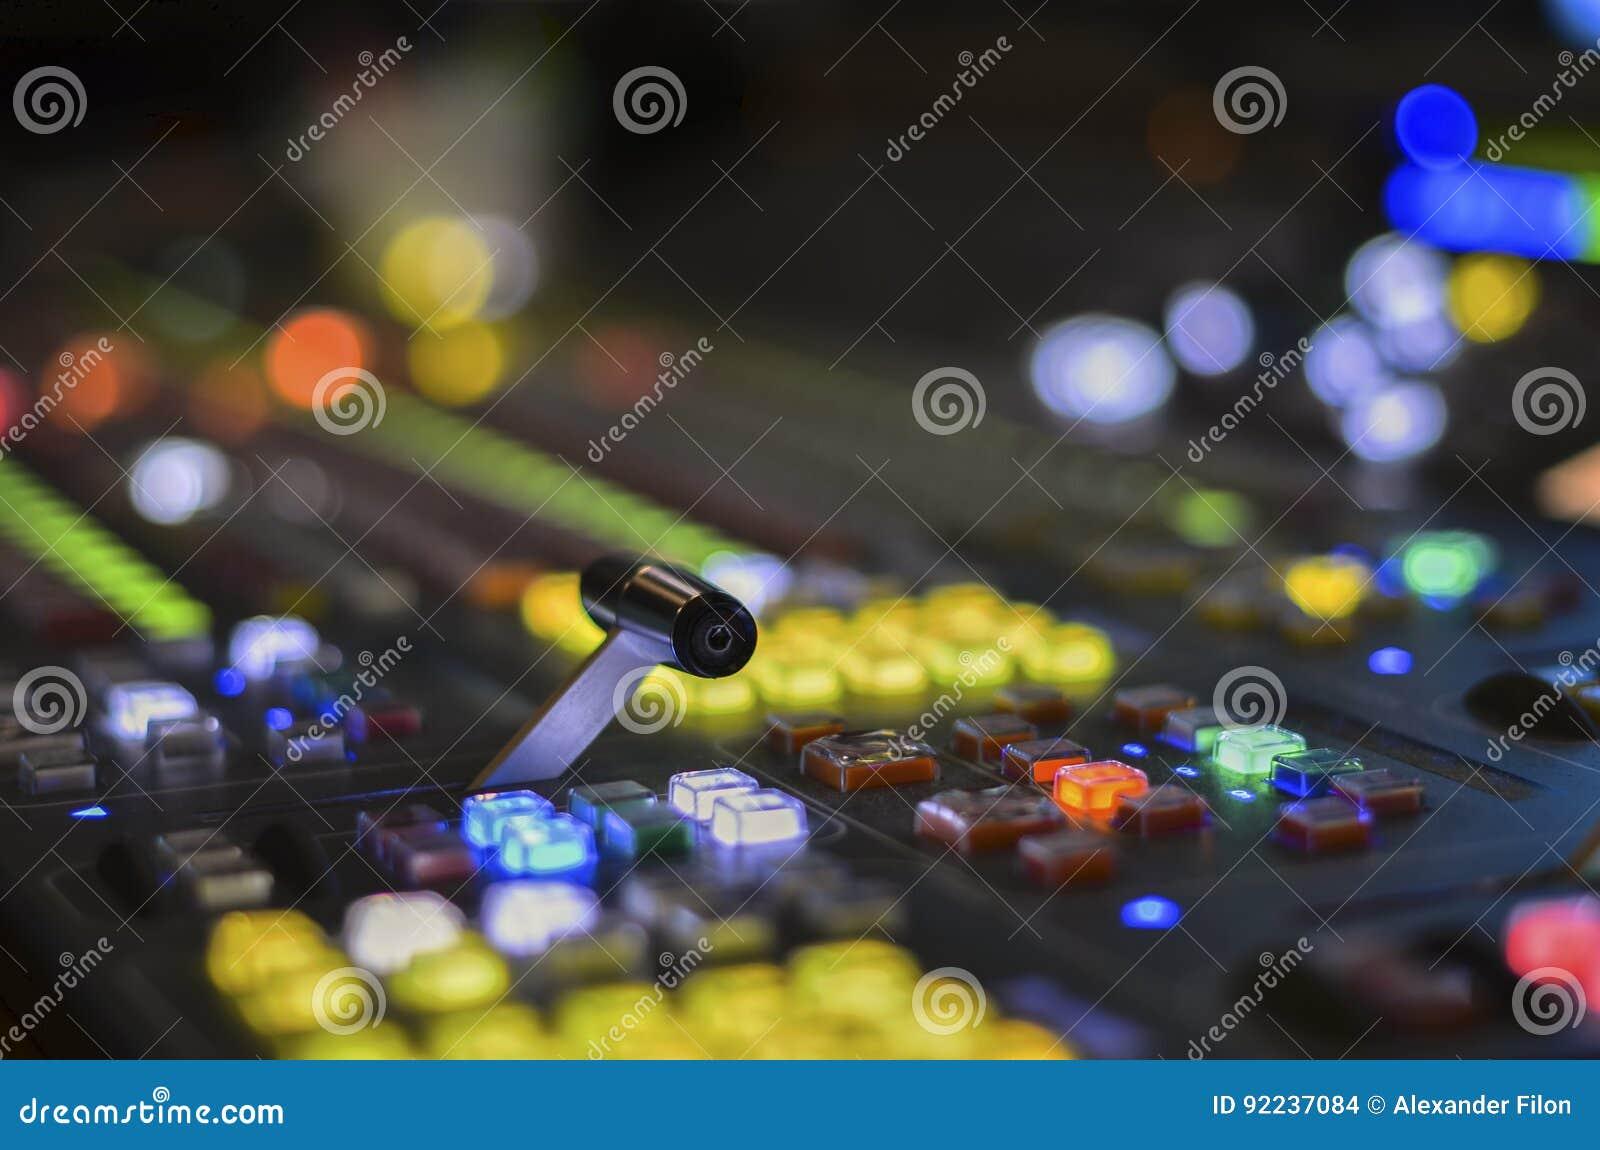 Tv video mixer